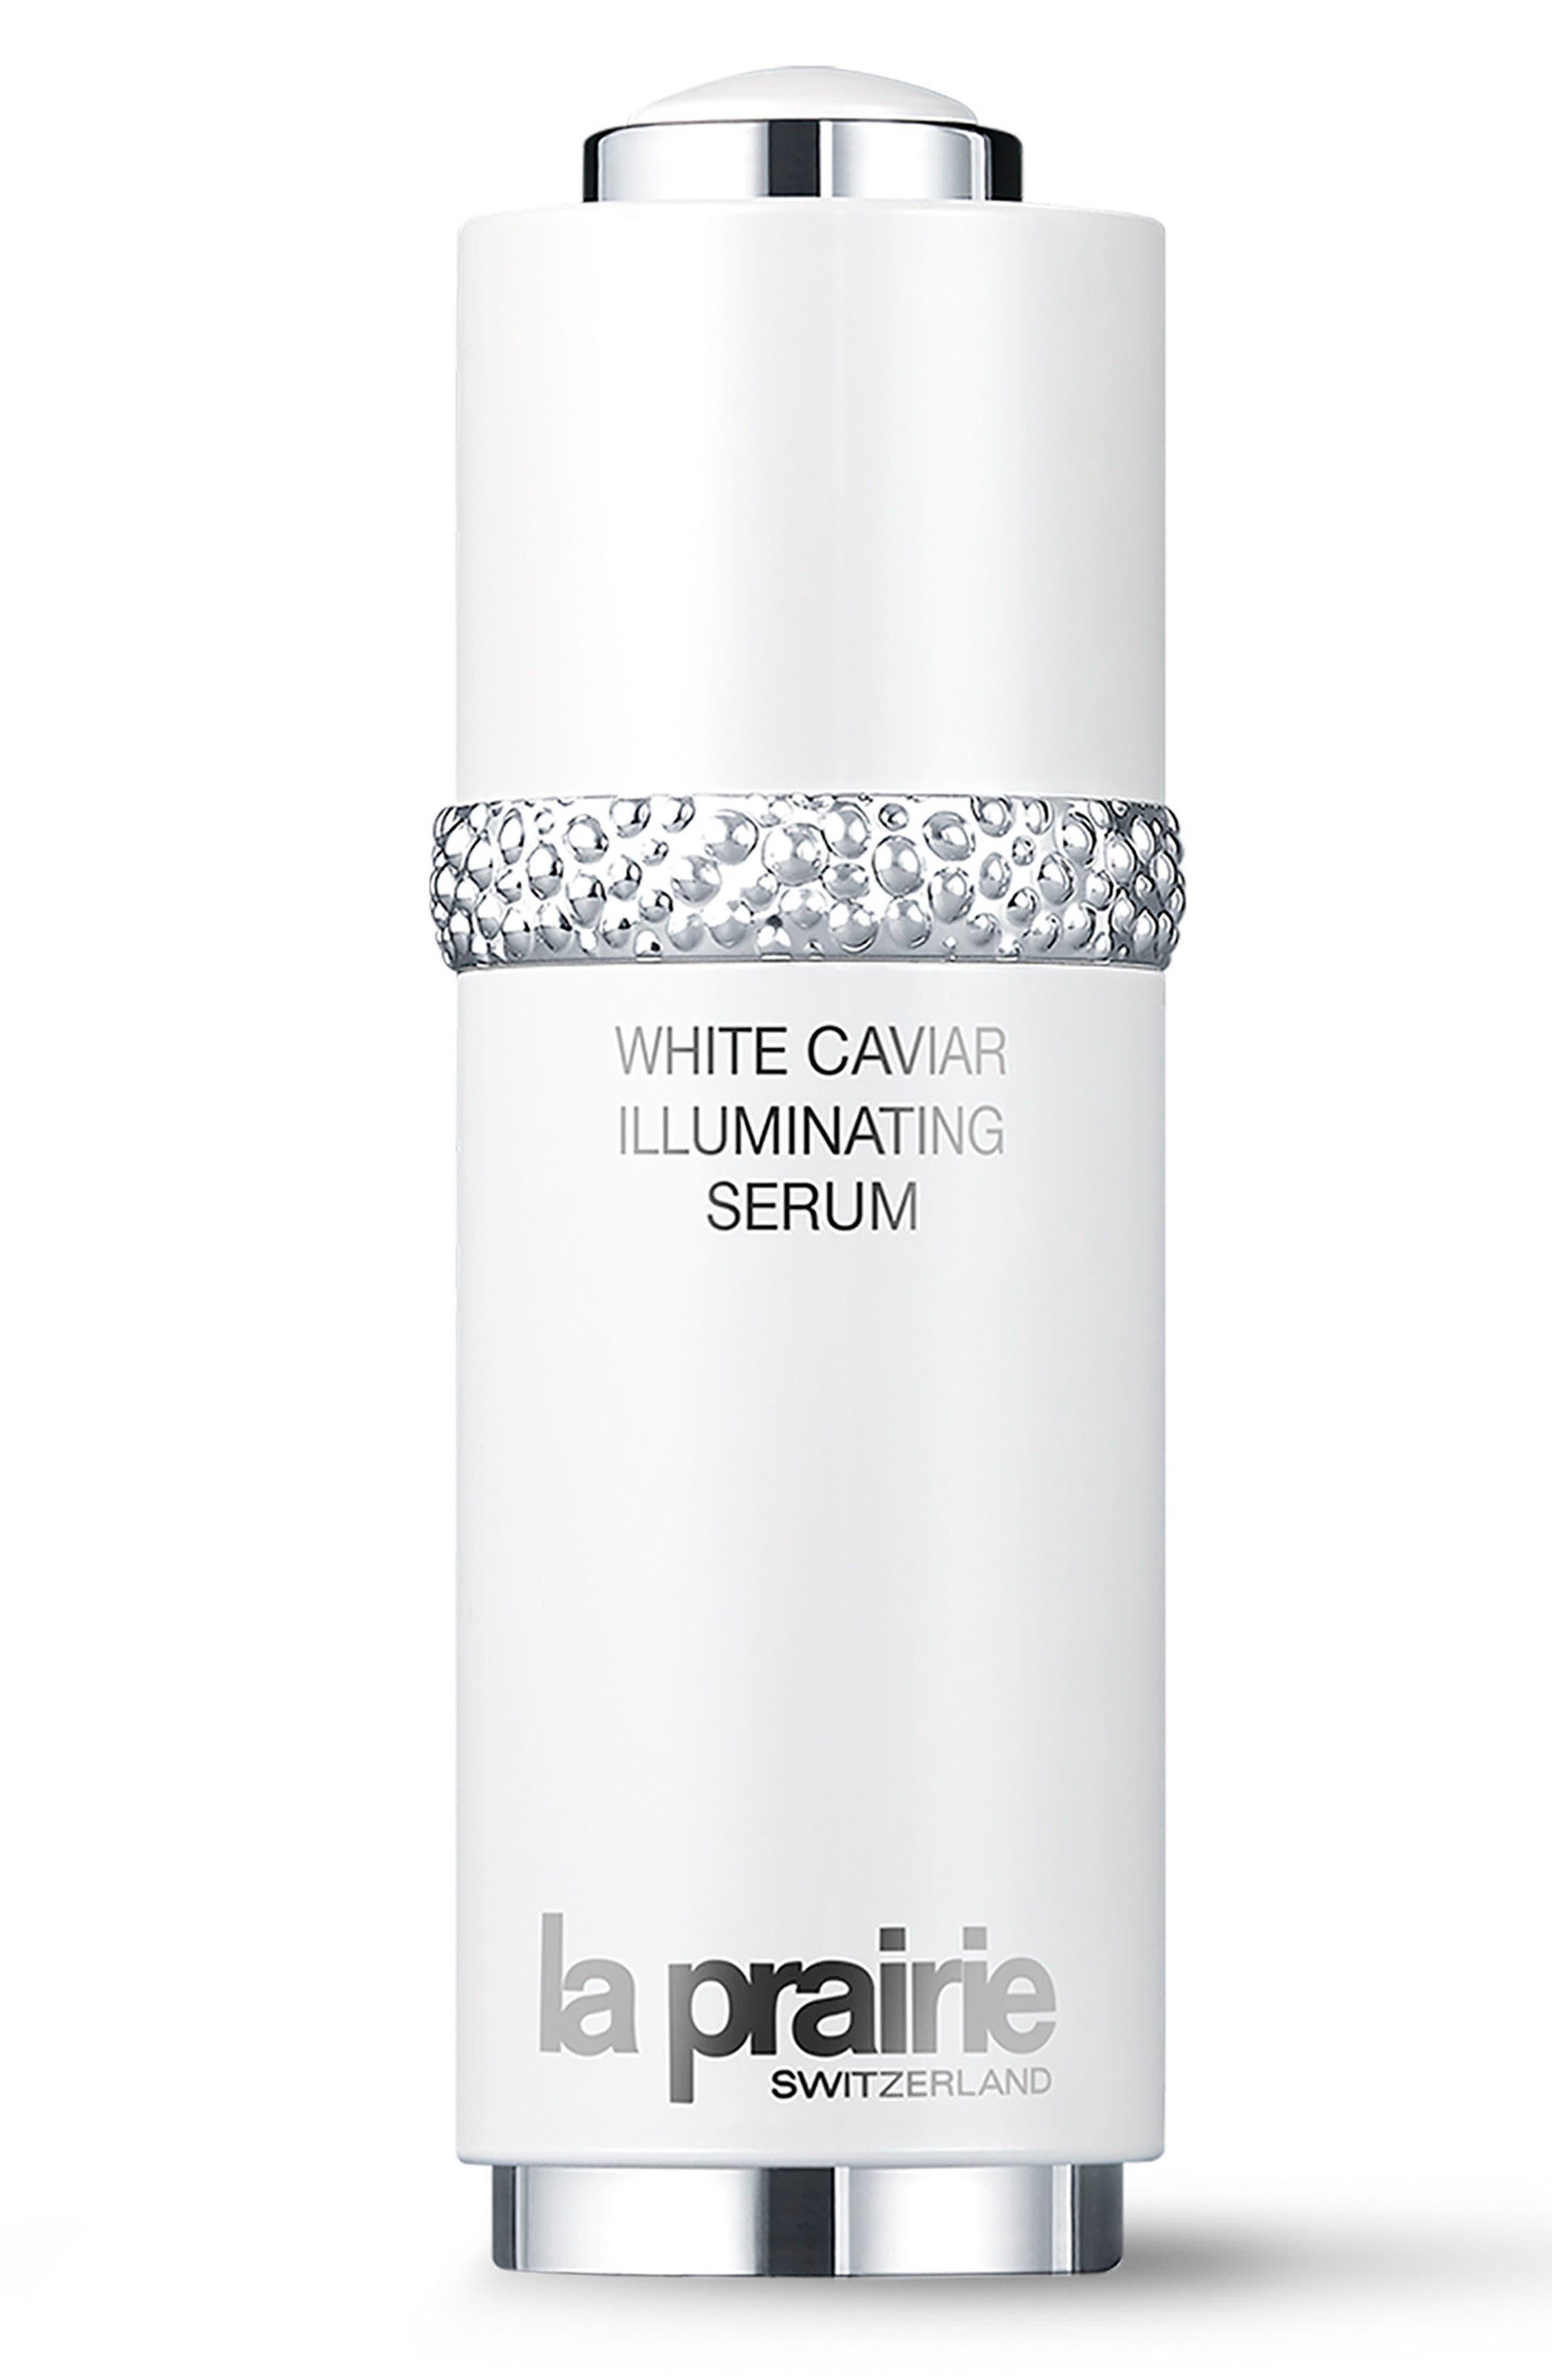 Alternate Image 1 Selected - La Prairie 'White Caviar' Illuminating Serum